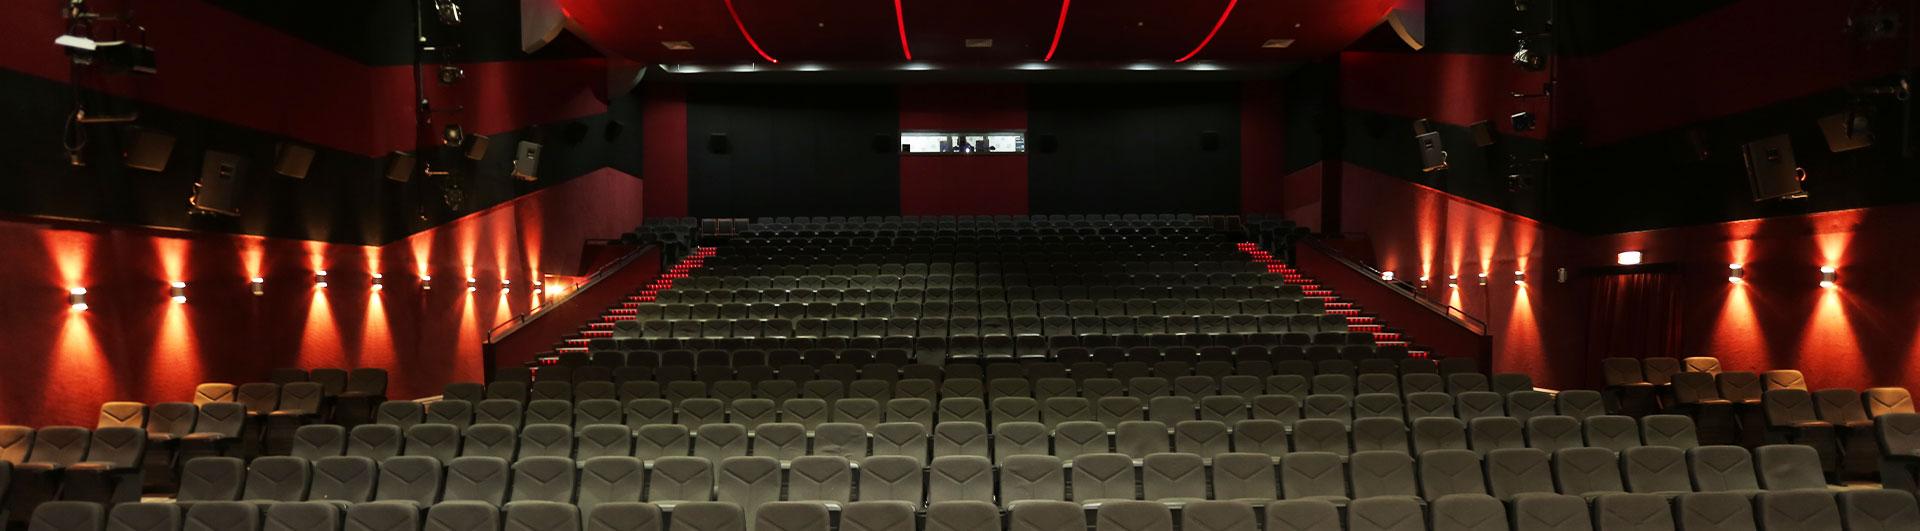 سینما بهمن سنندج